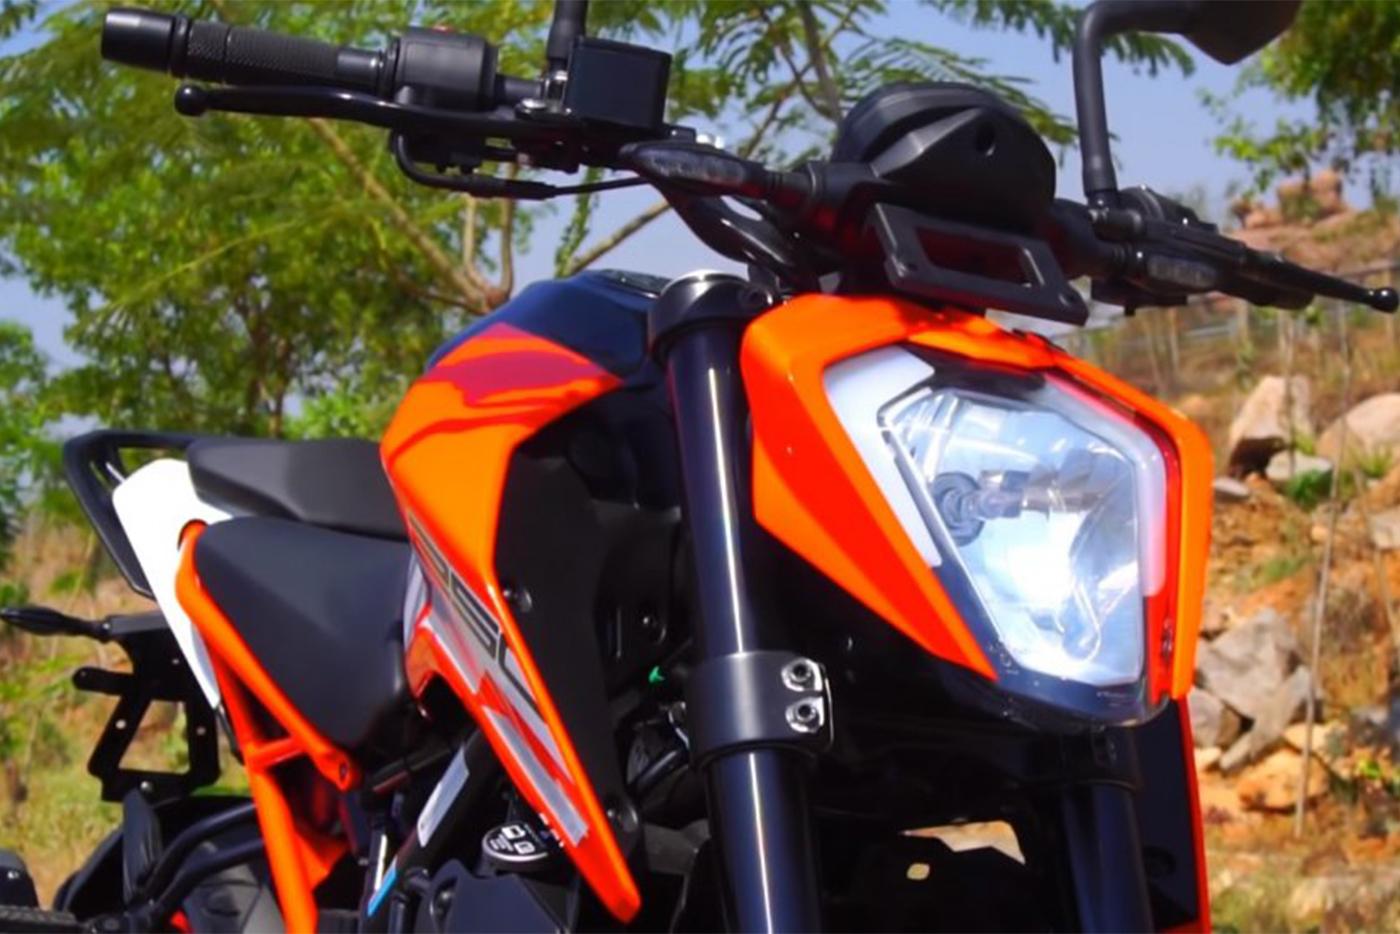 ktm-250-duke-abs-headlight-b489.jpg